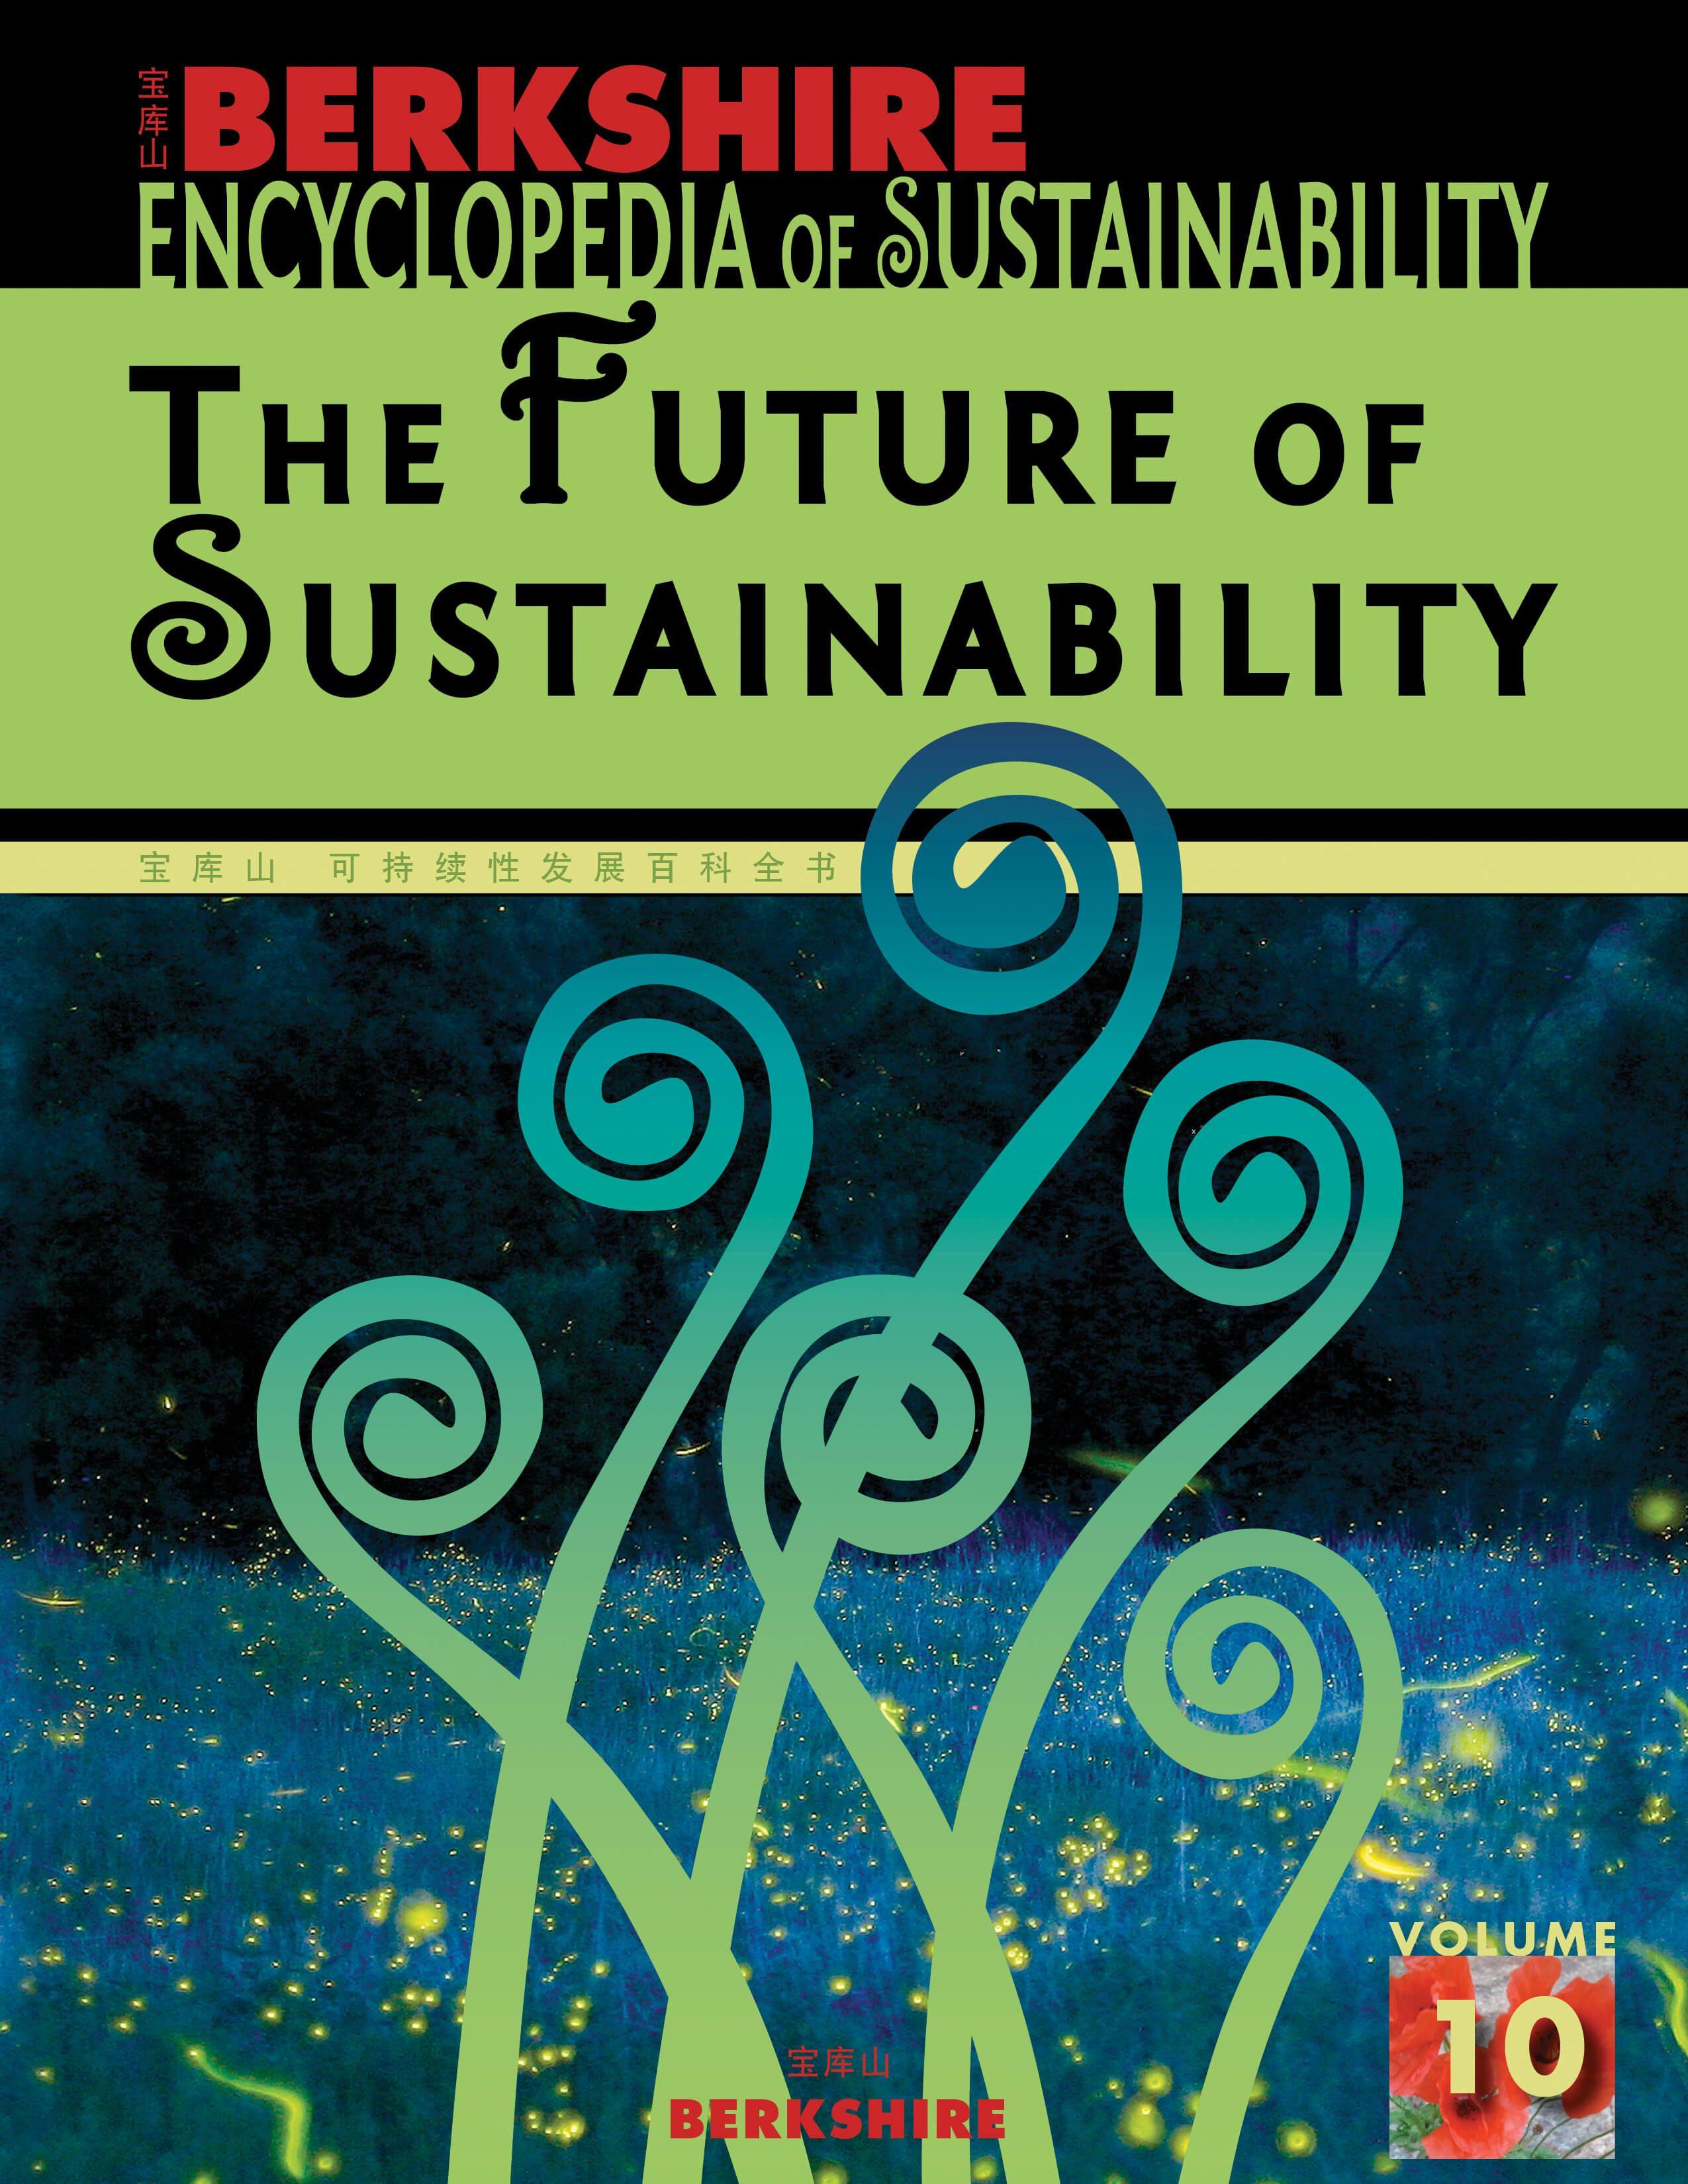 berkshire encyclopedia of sustainability vol  the future of  sustainability